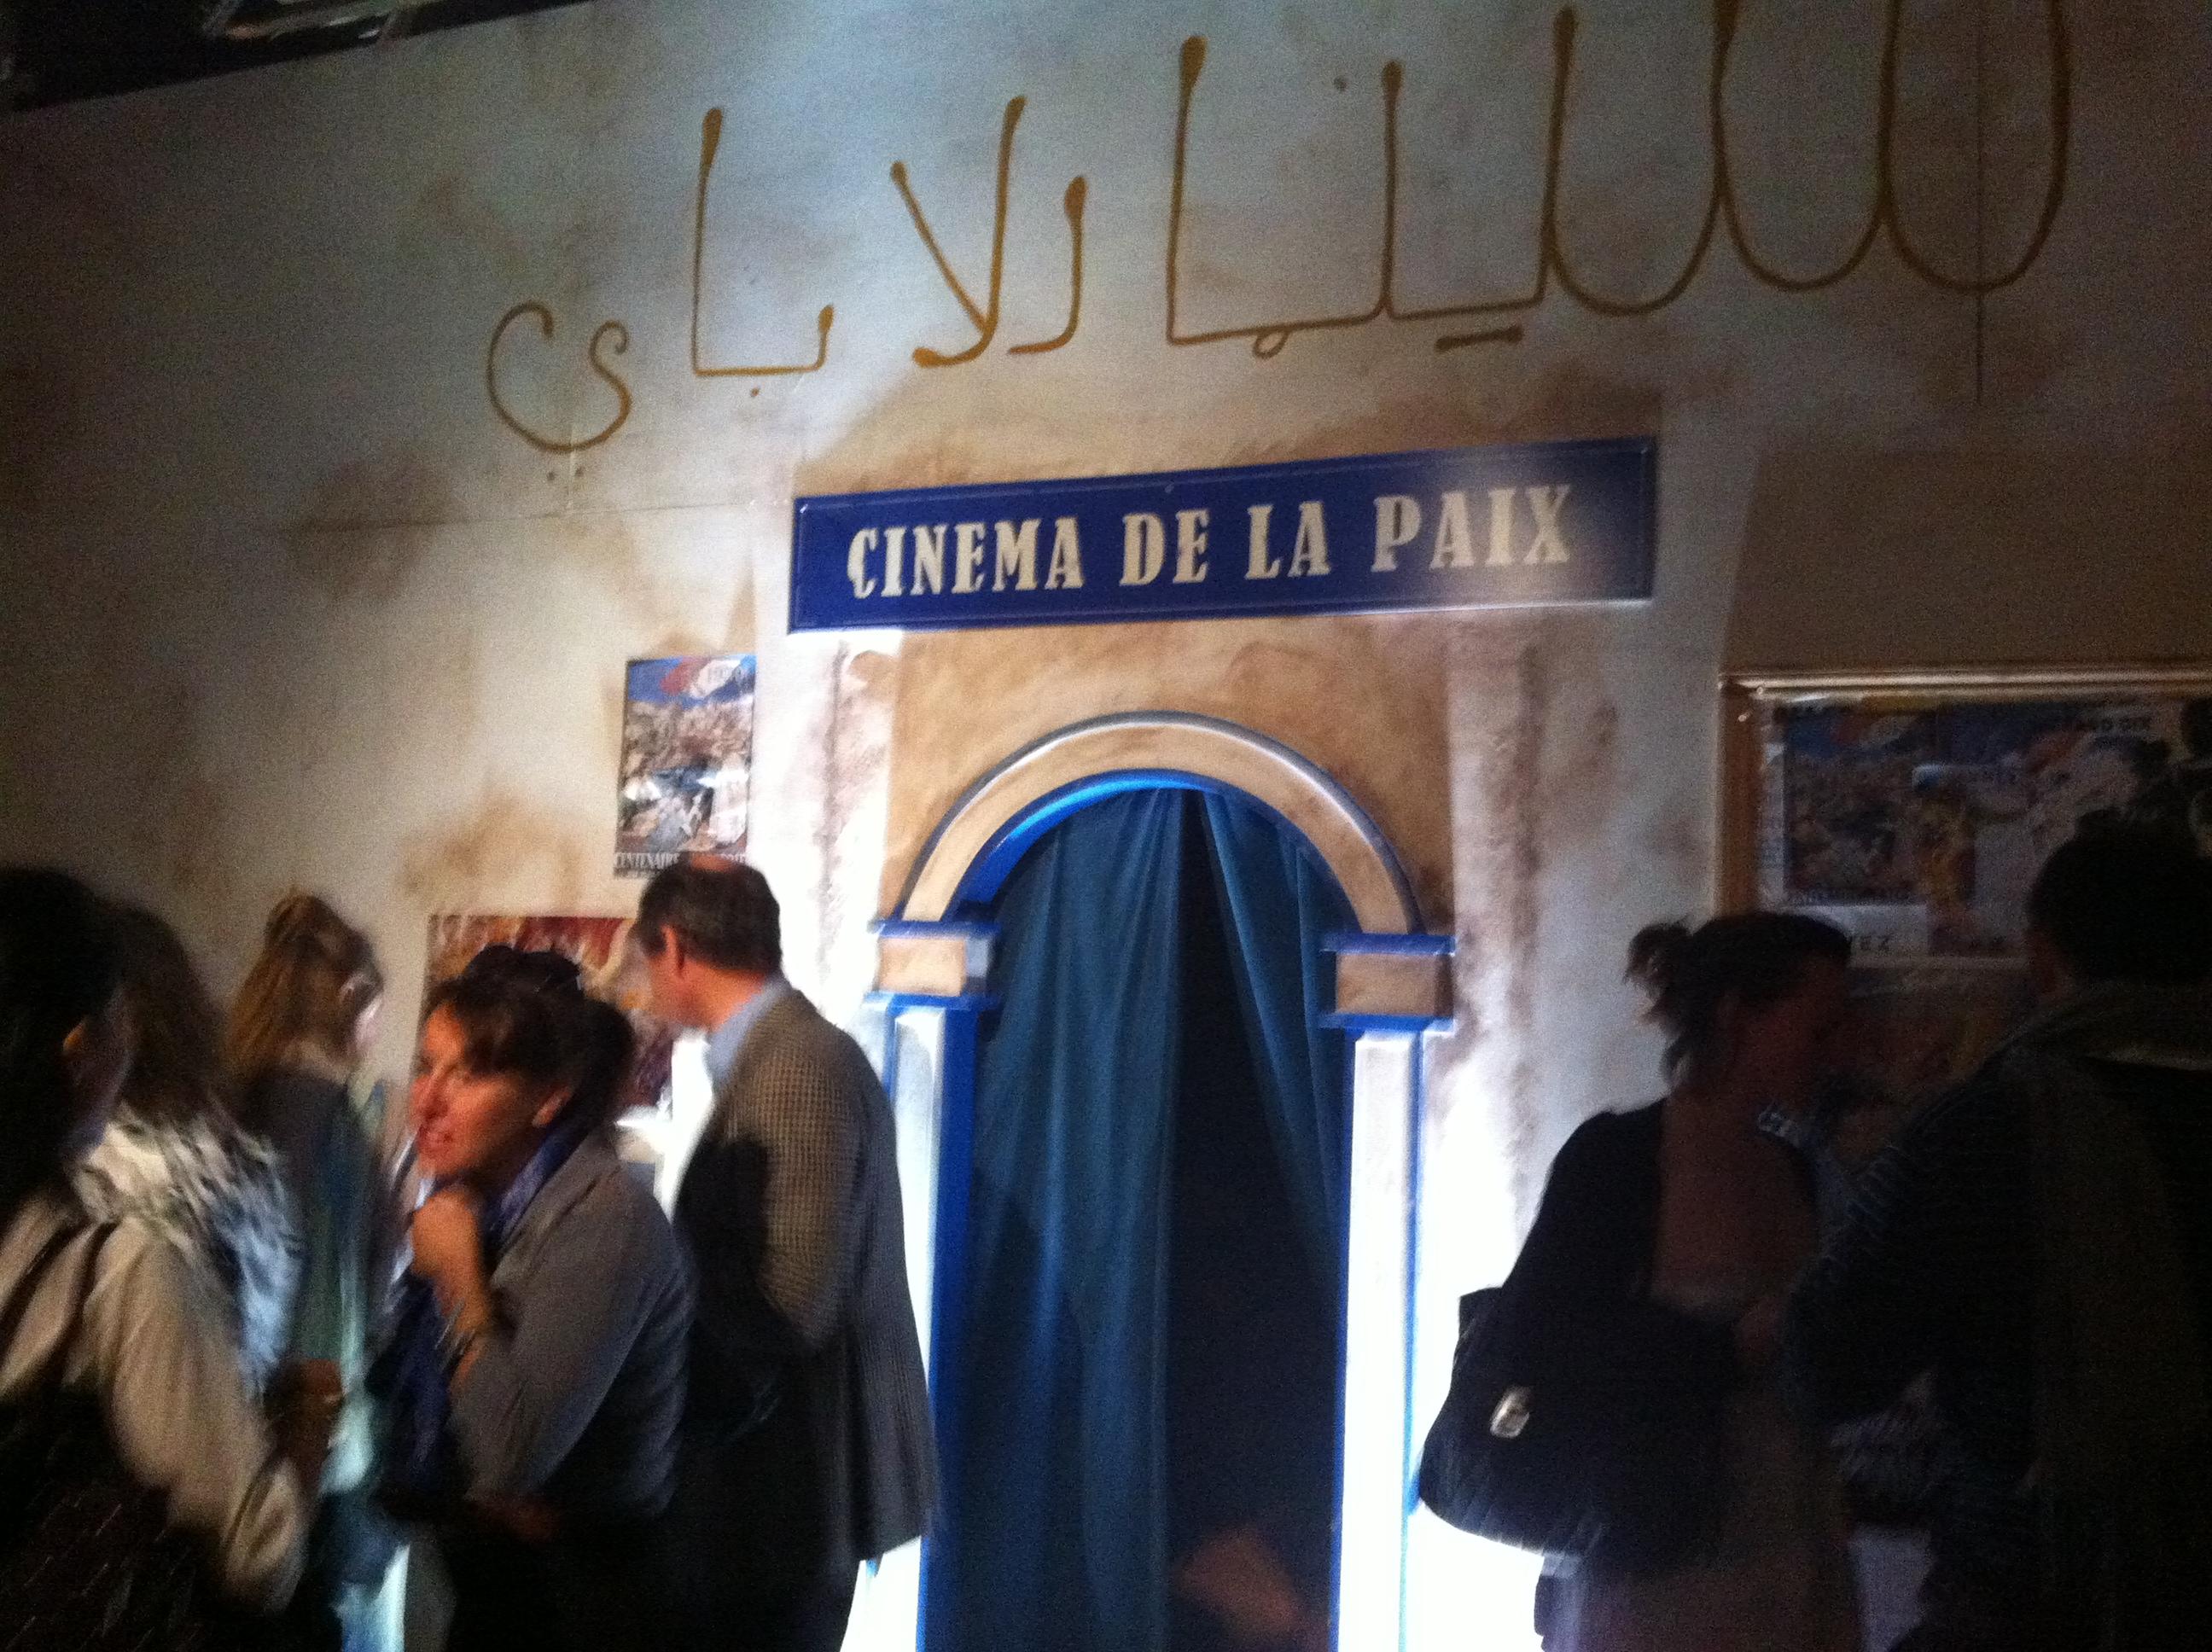 Secret Cinema's screening room for The Battle of Algiers